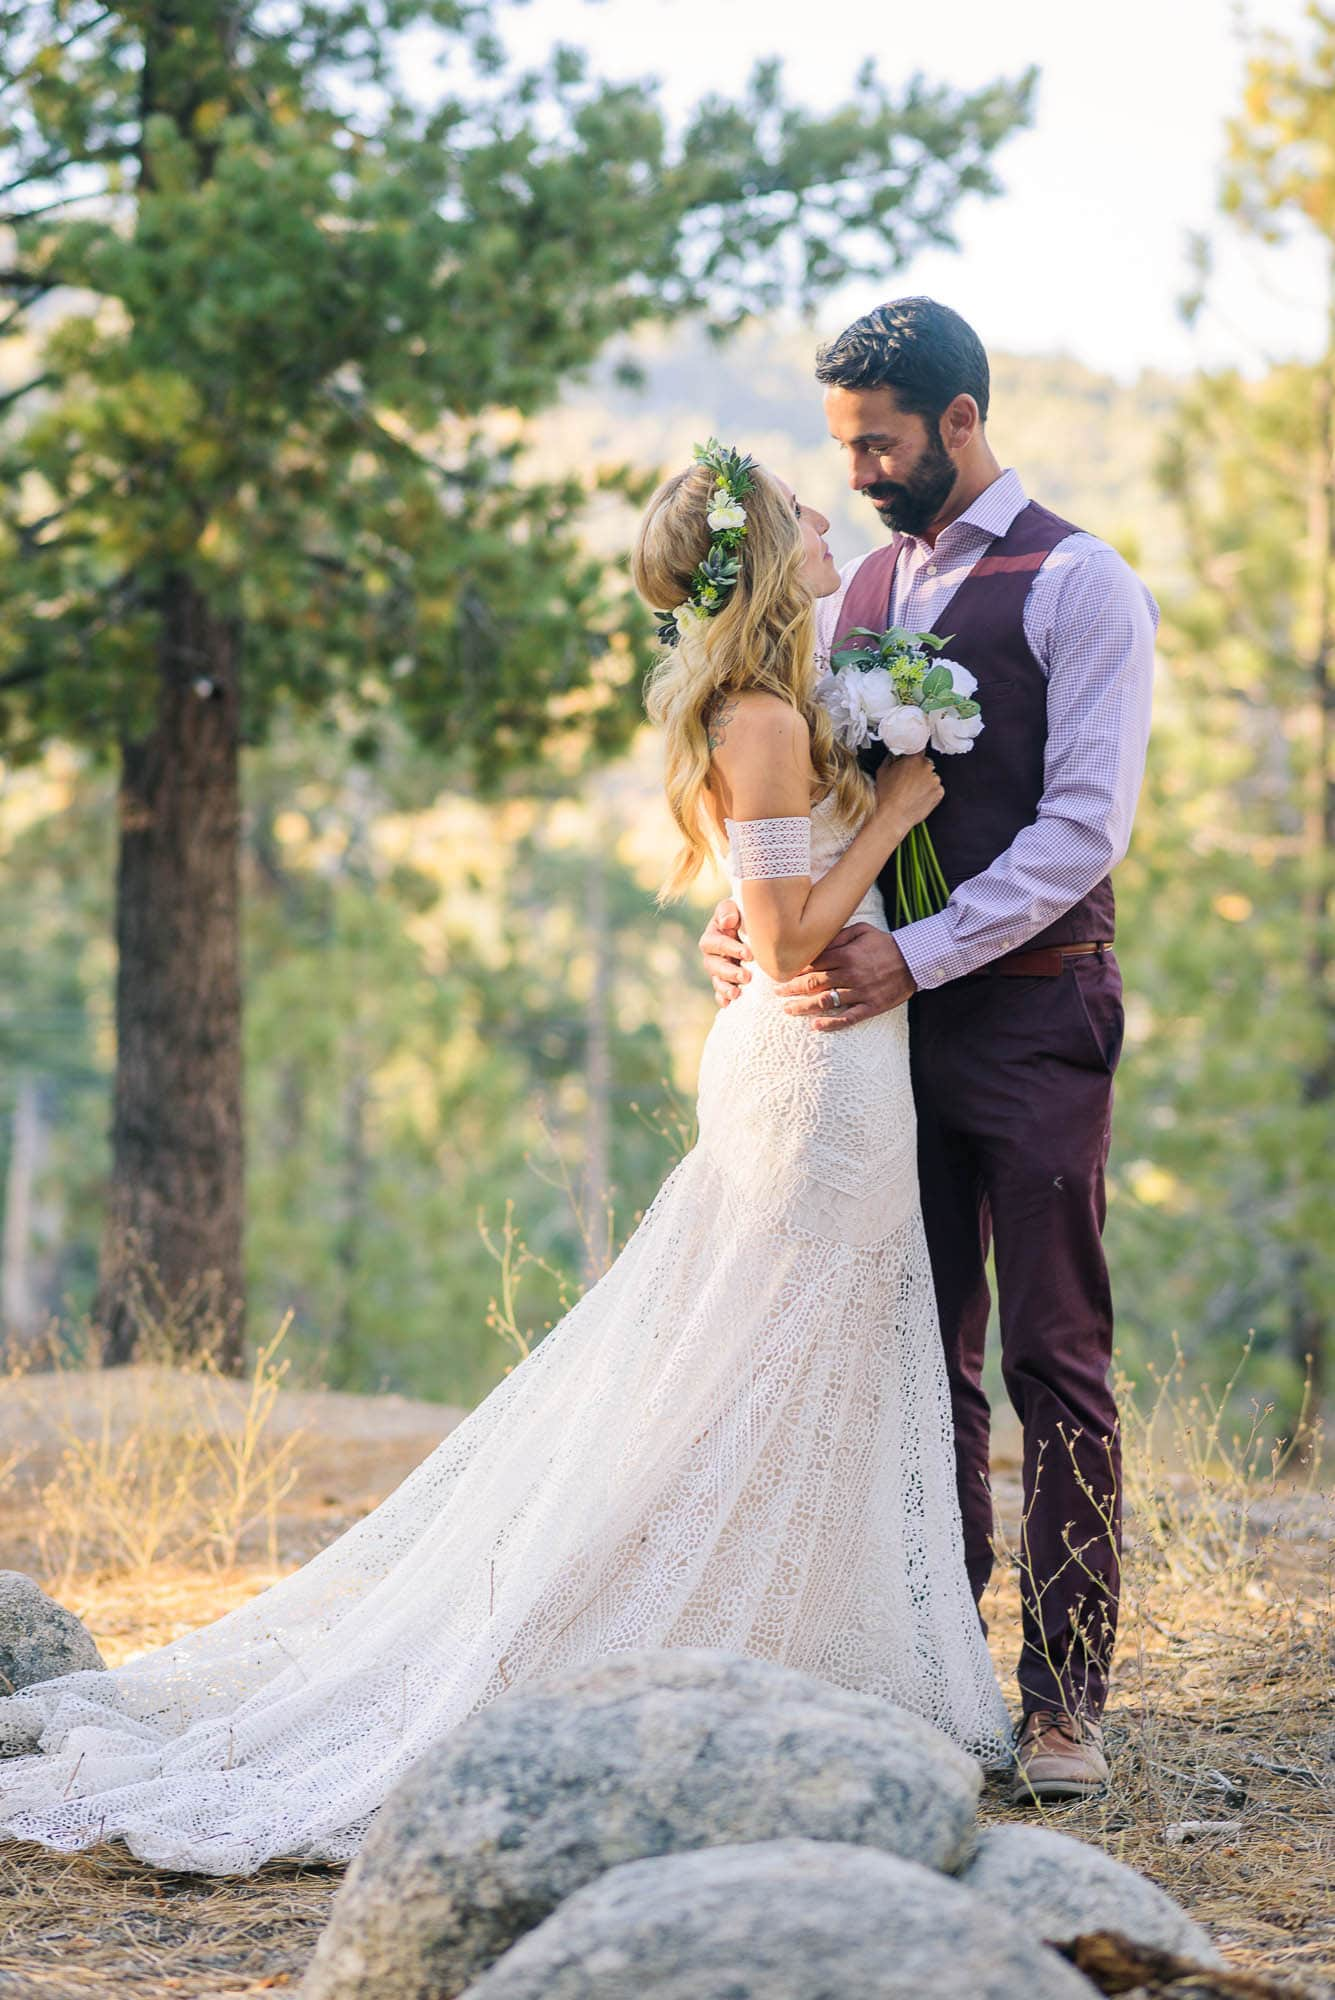 031_Alan_and_Heidi_Wedding_Natalie_Mike